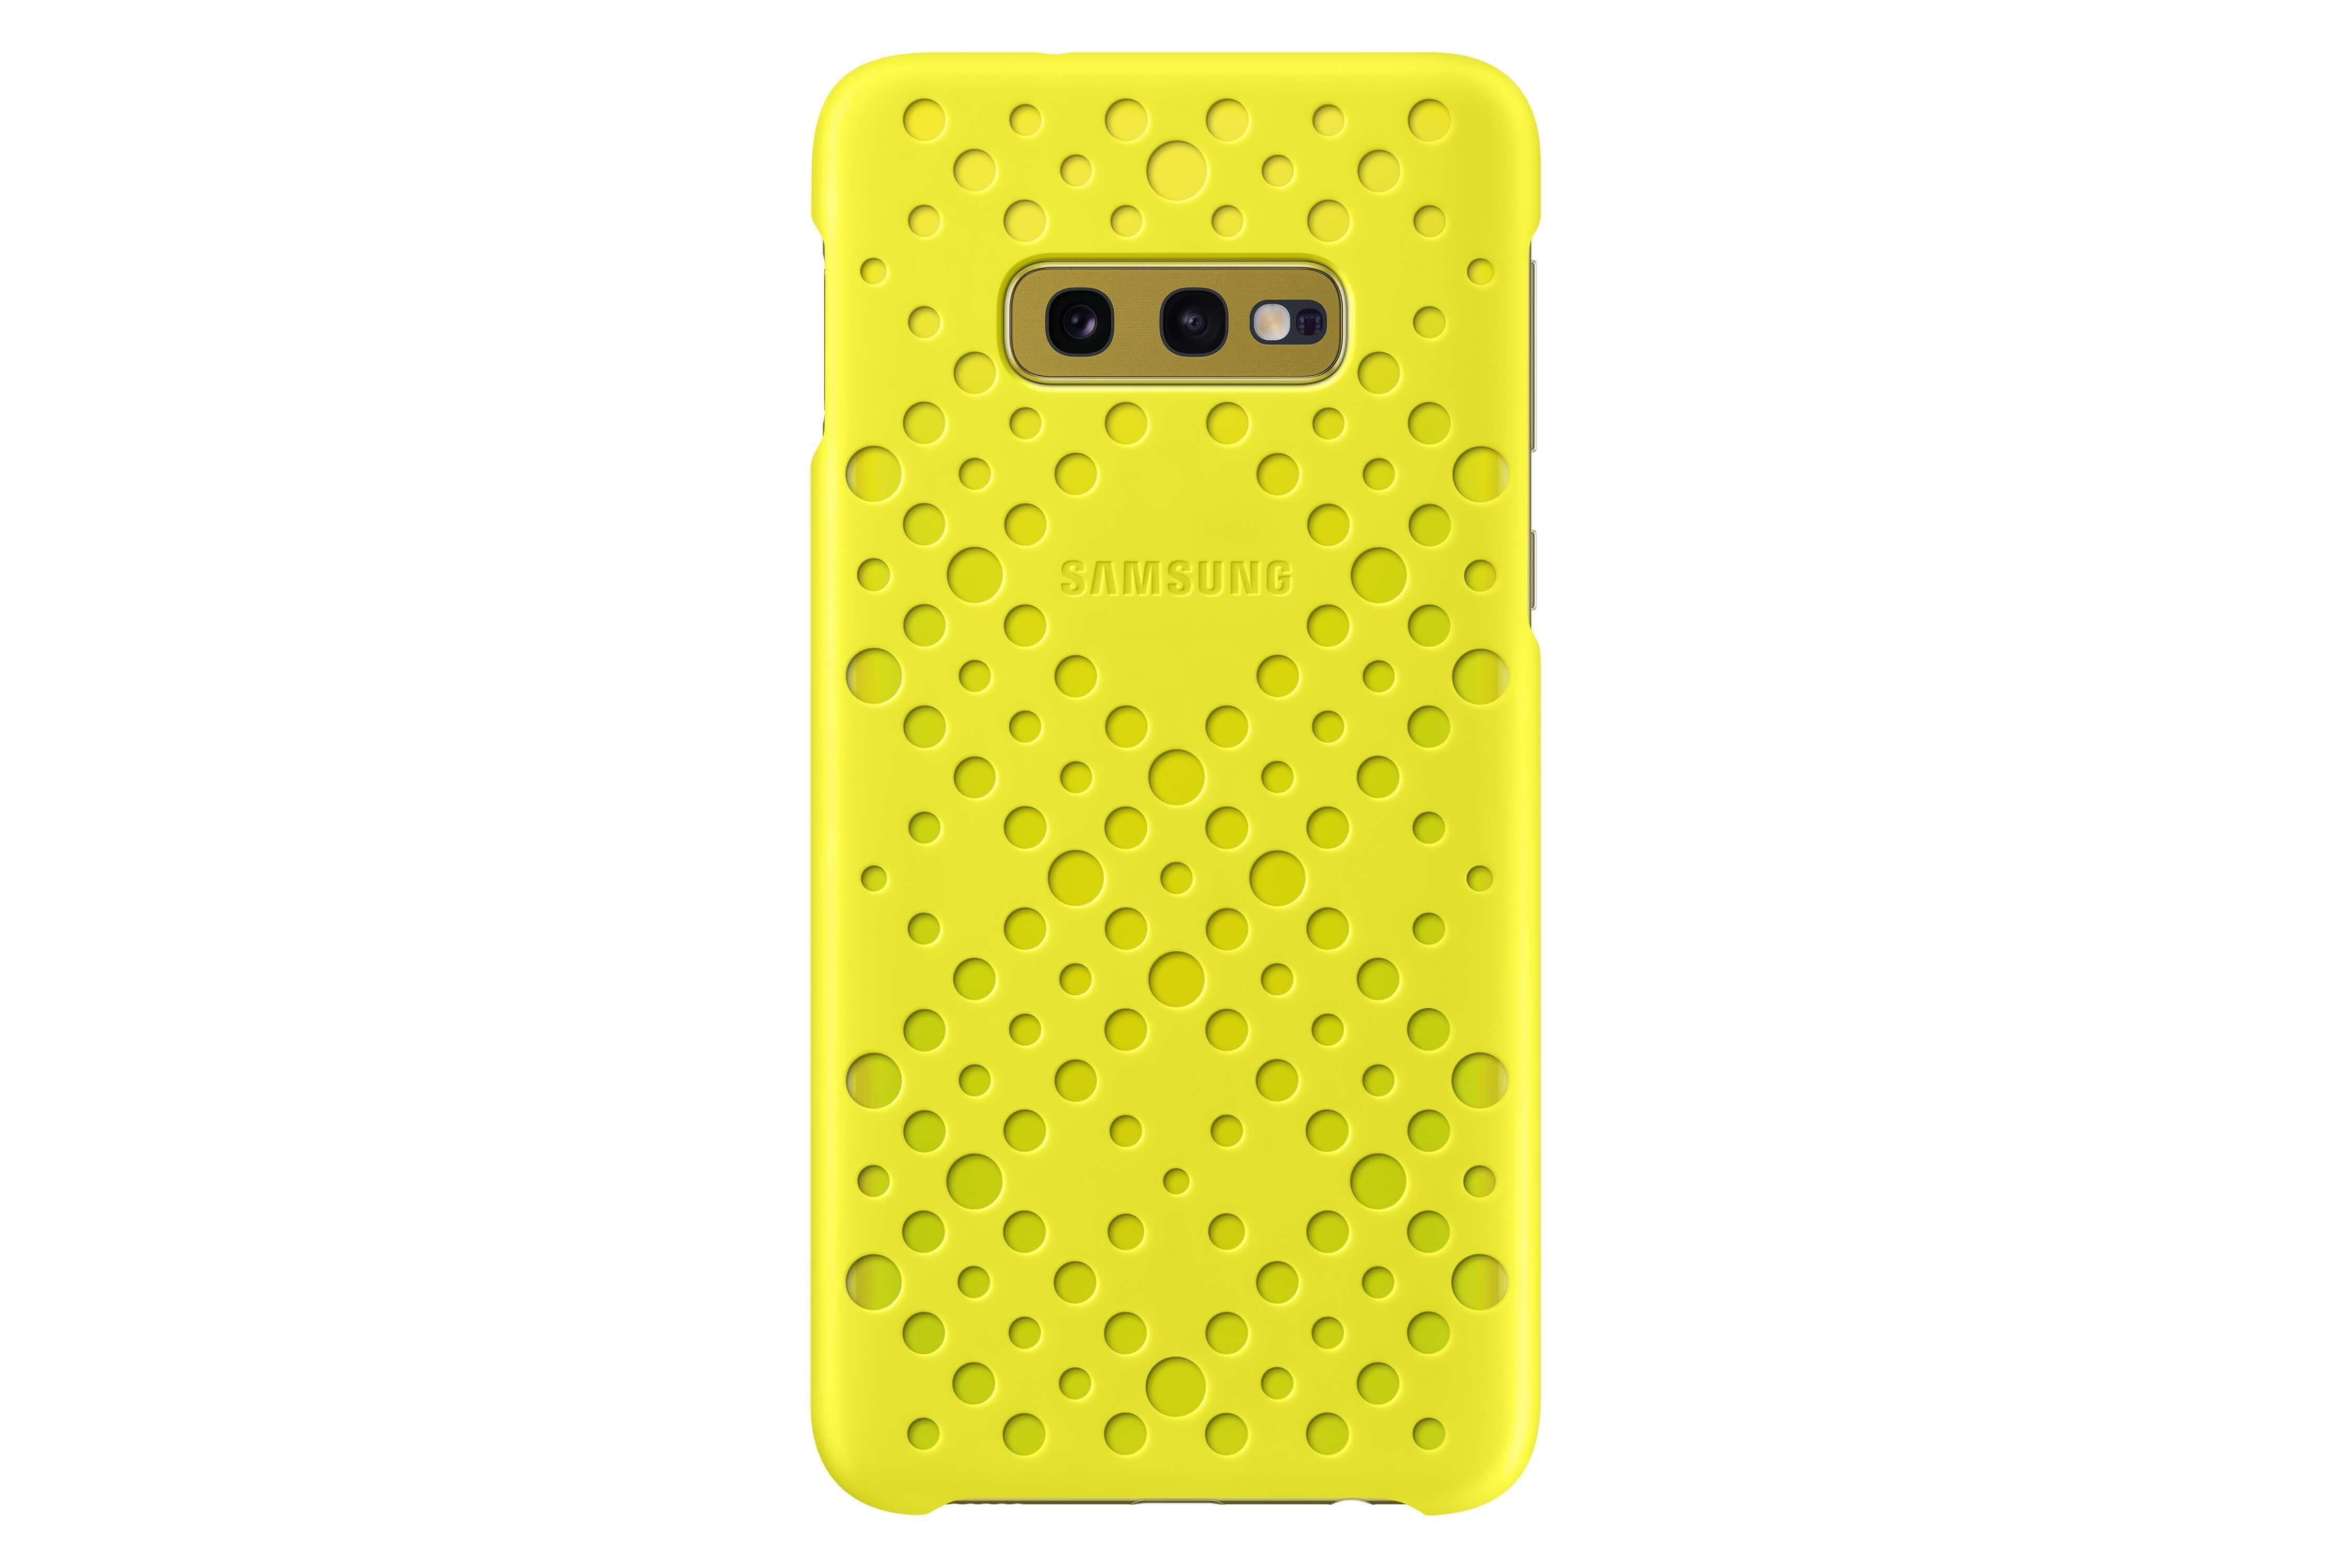 Samsung - Coques Perforées Galaxy S10e - Blanc & Jaune - Coque ...